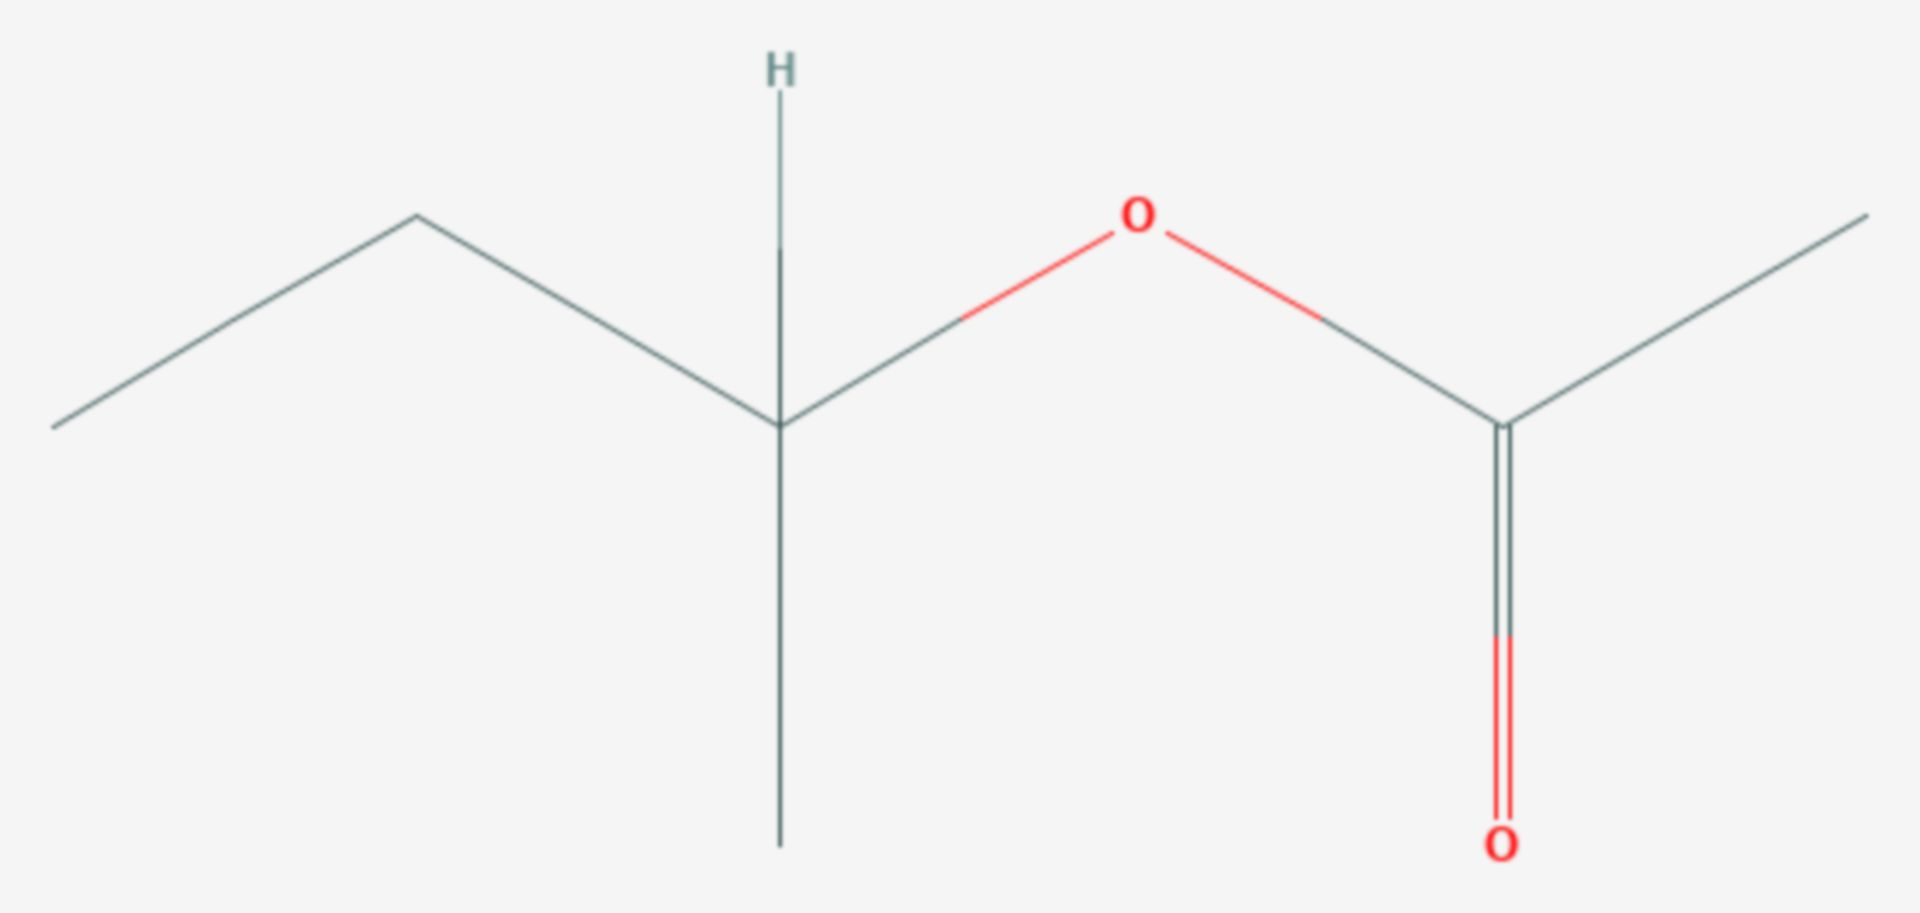 Essigsäure-sec-butylester (Strukturformel)